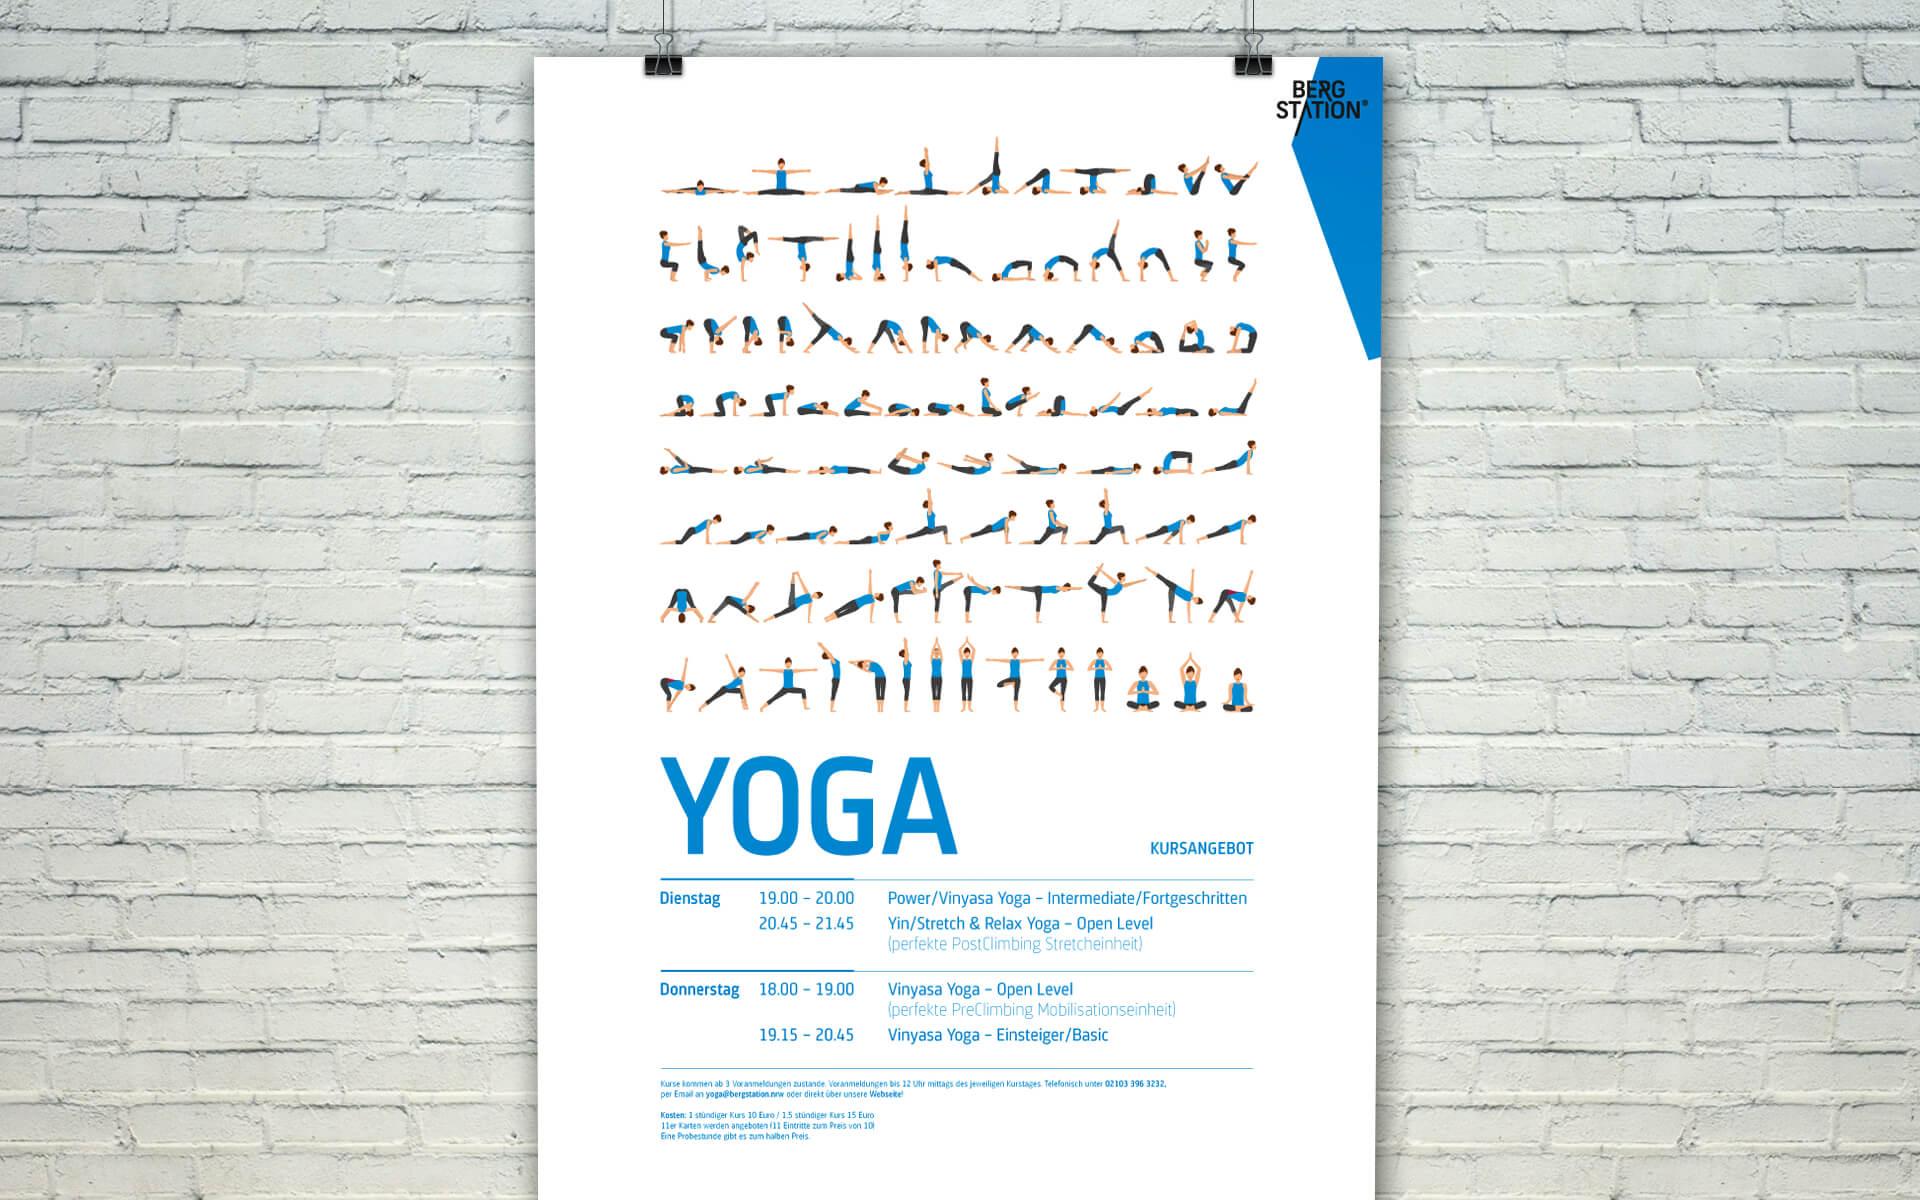 Bergstation Corporate Design, Yoga Plakat